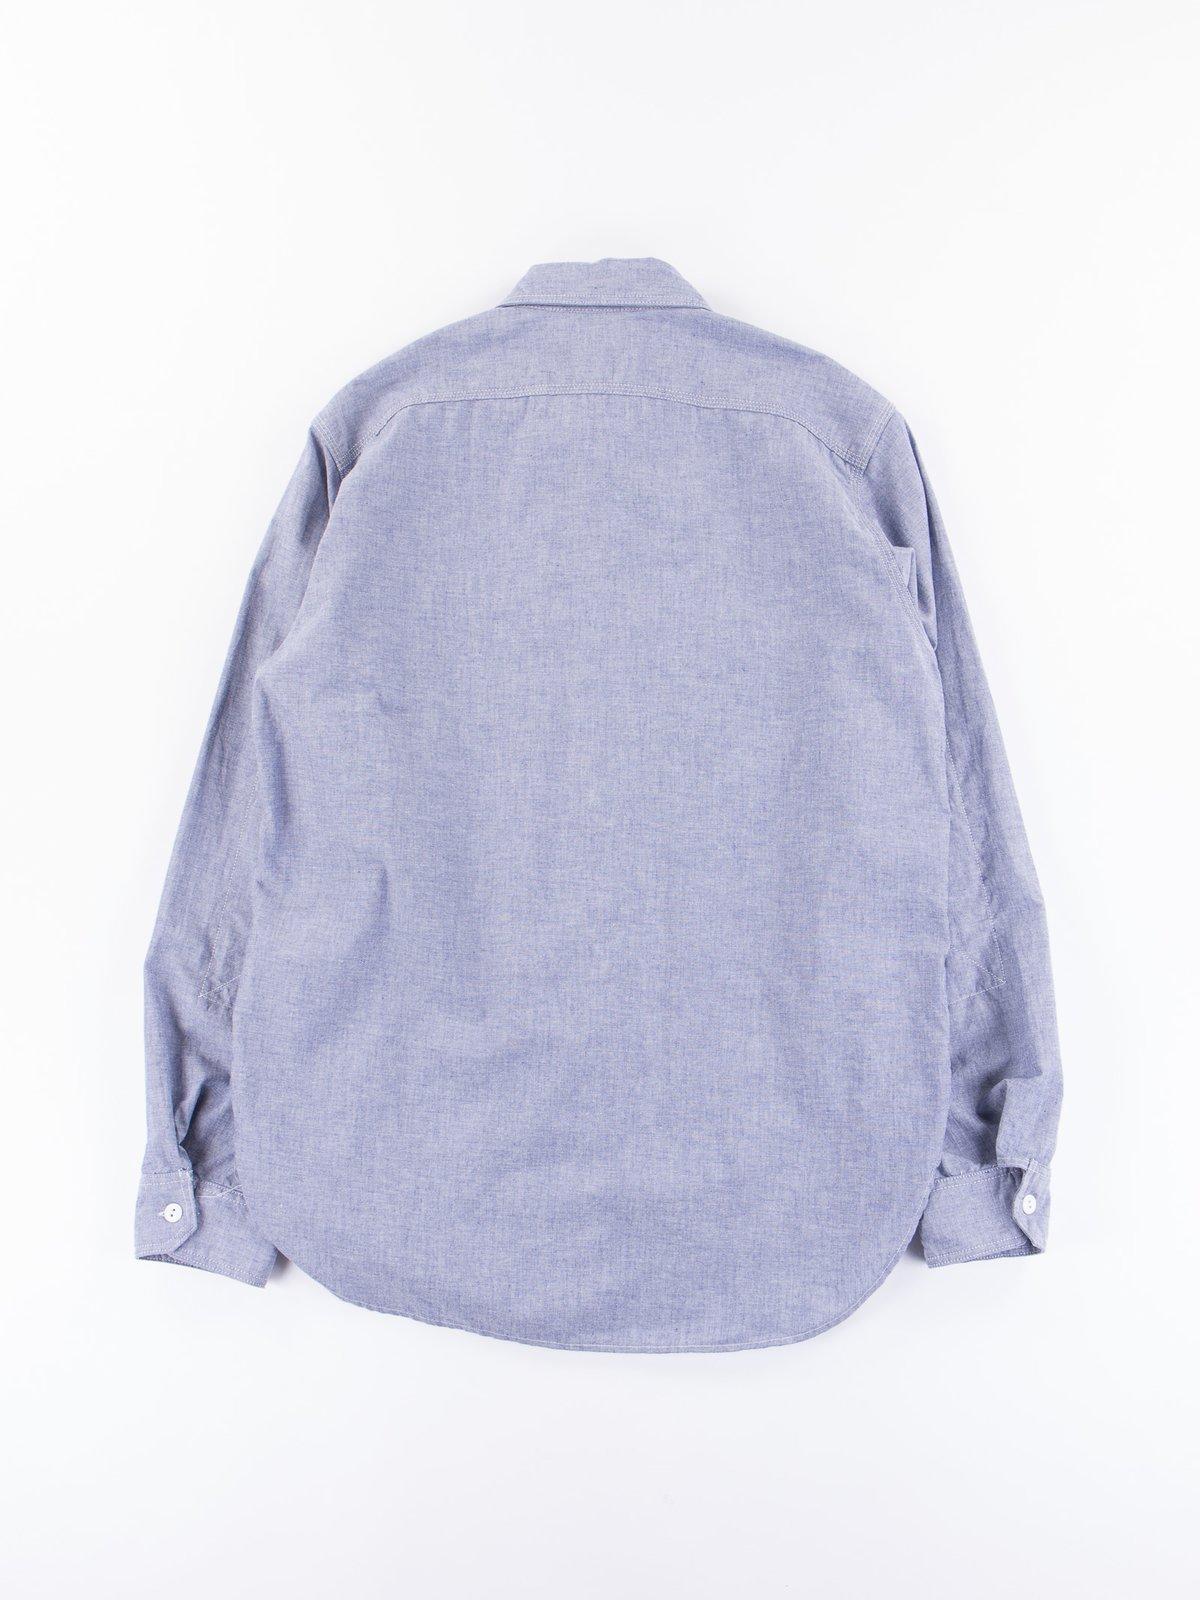 Light Blue Light Weight Cotton Chambray Work Shirt - Image 4